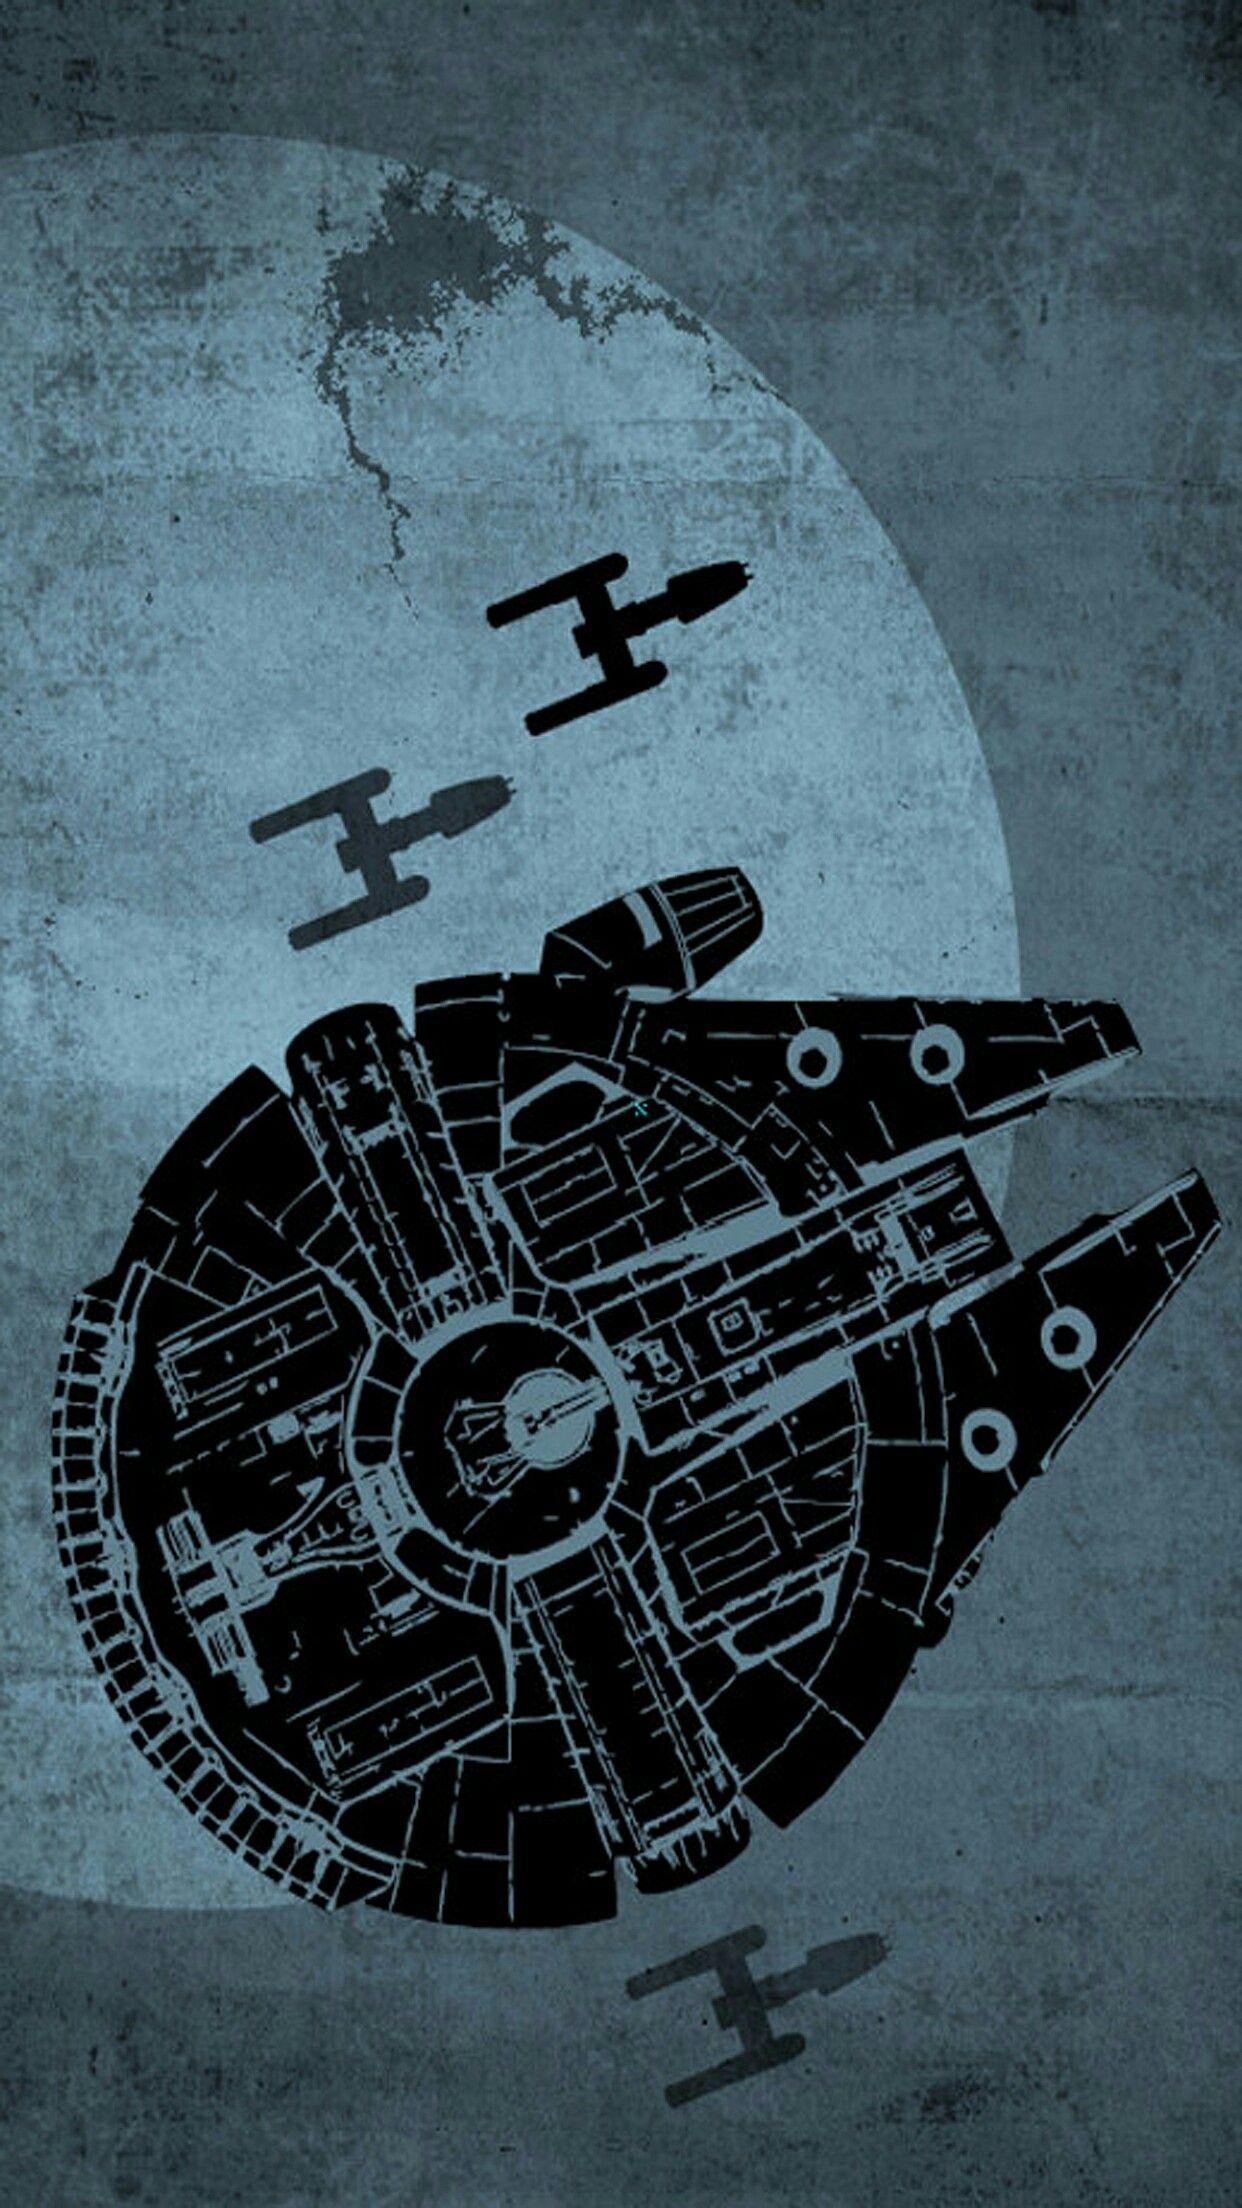 Pin de Tyler Sheffield em Star Wars Star wars poster